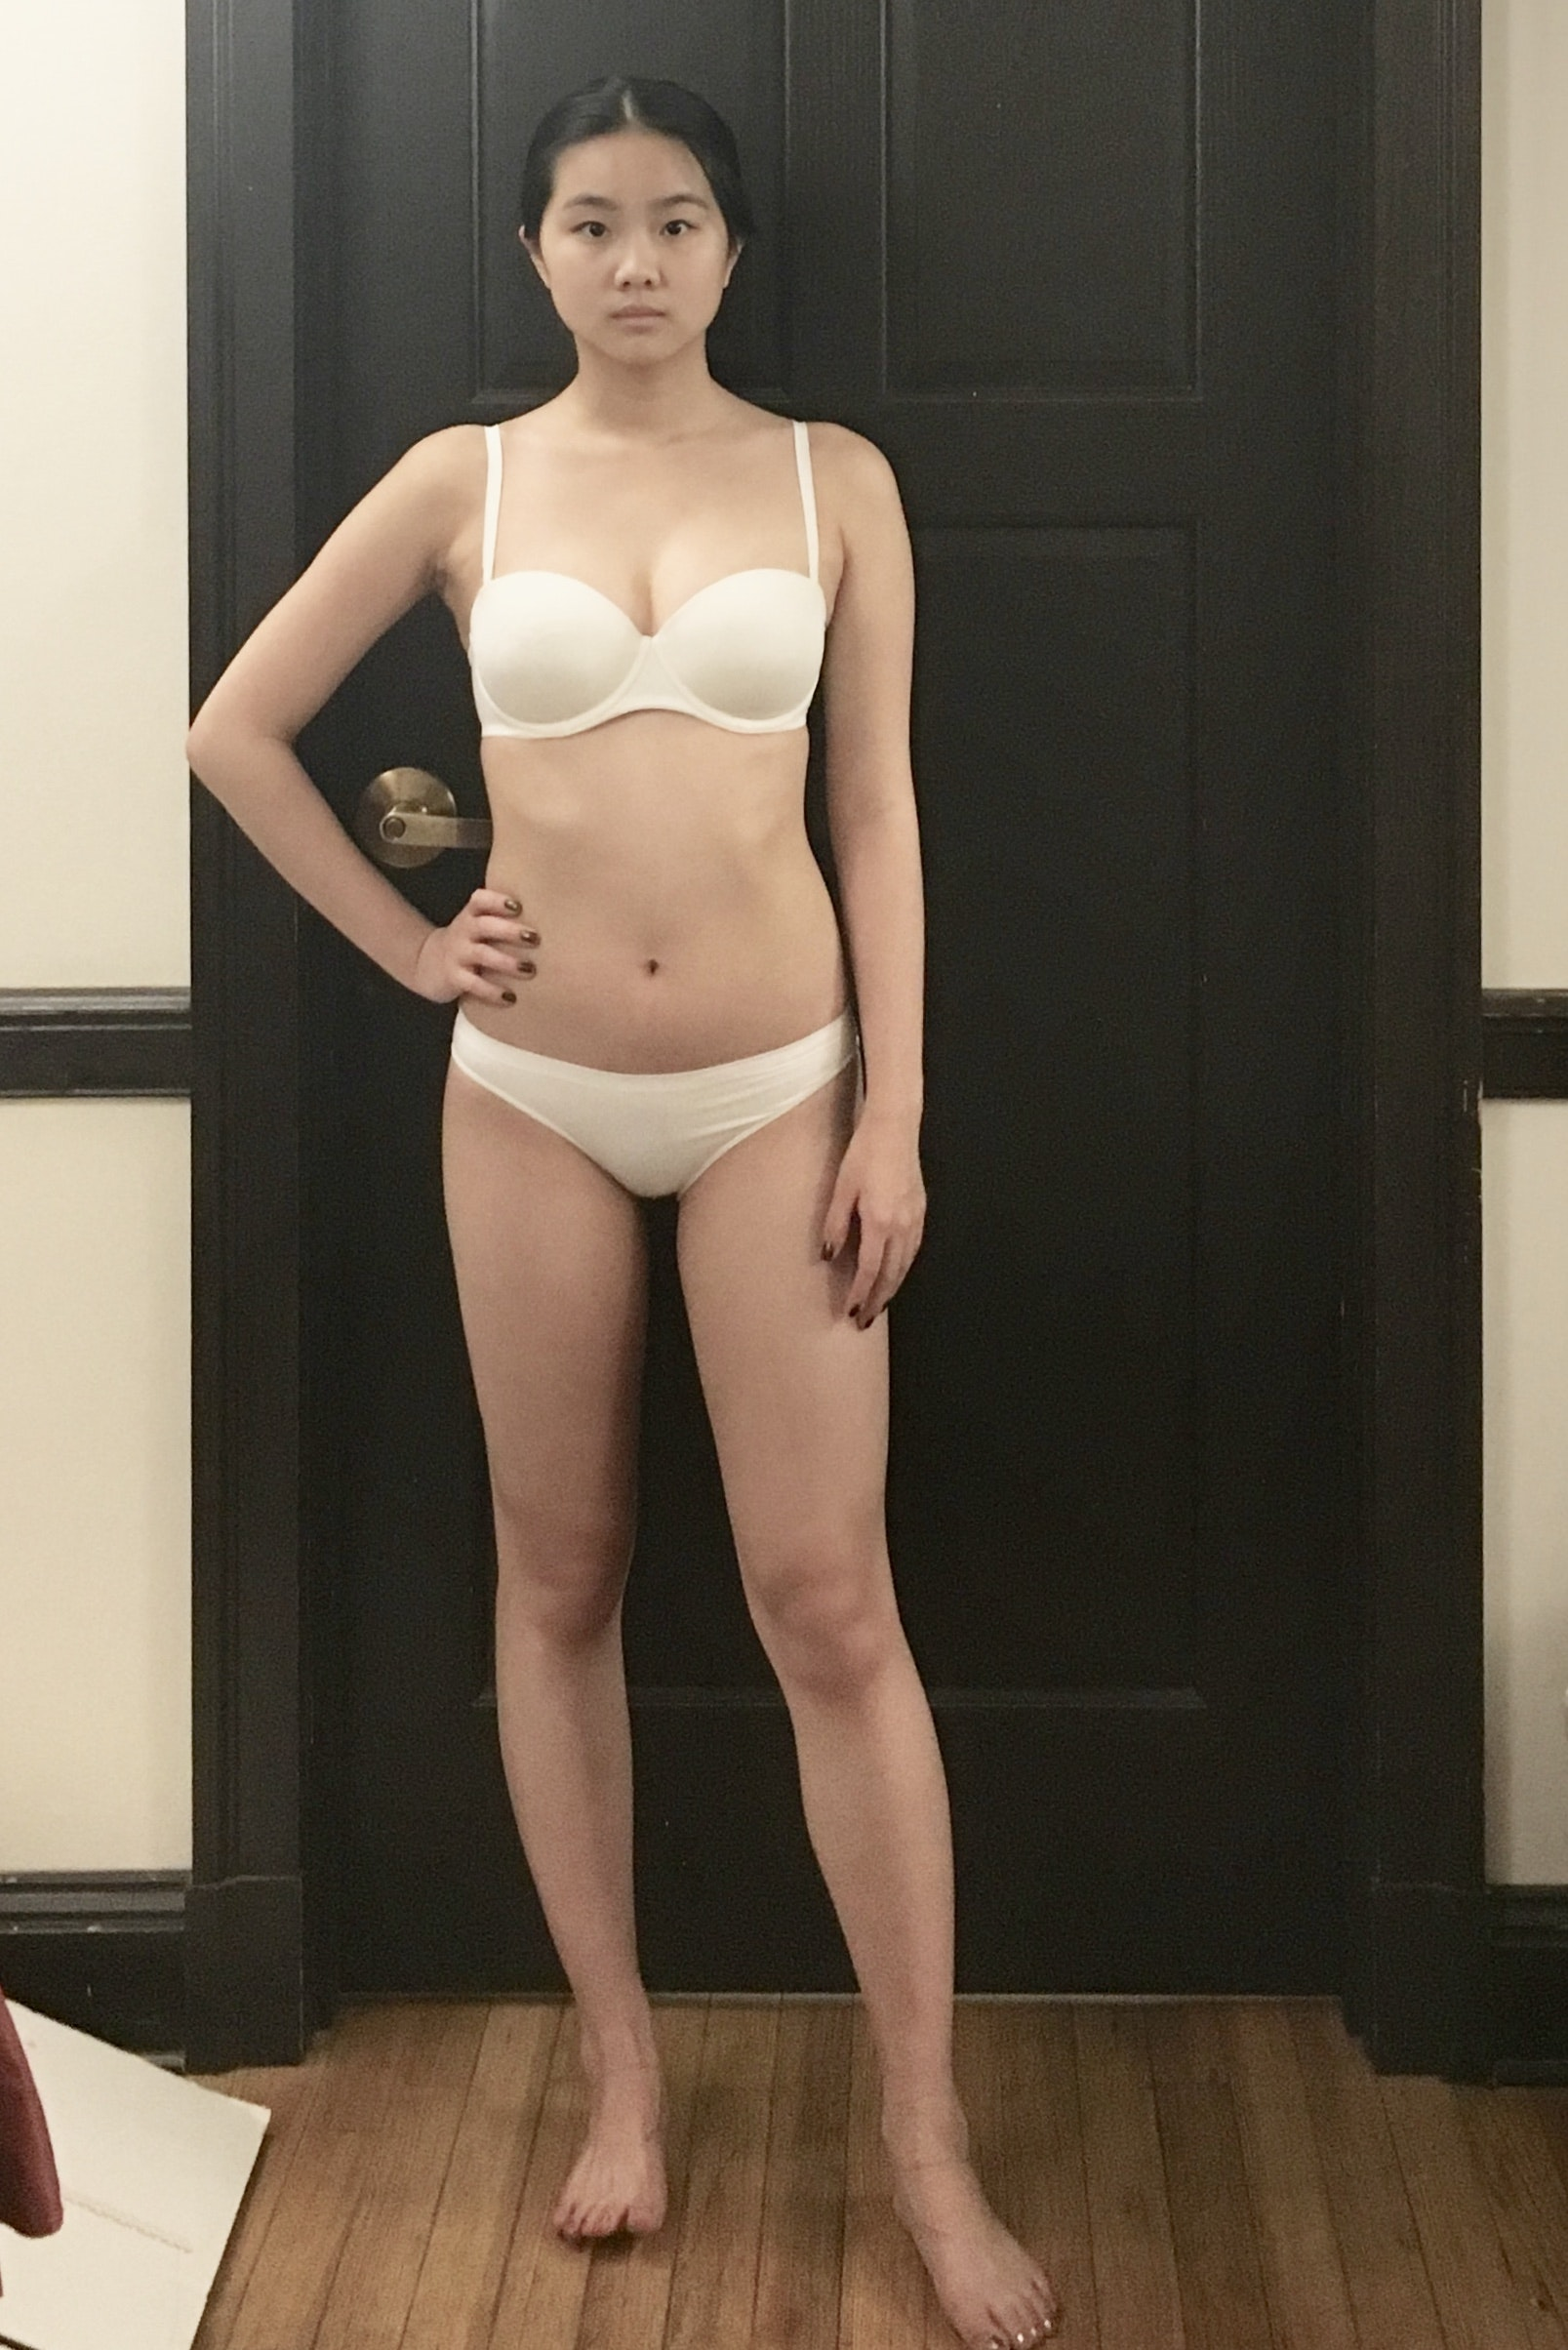 Kathy Zhang's Model portfolio